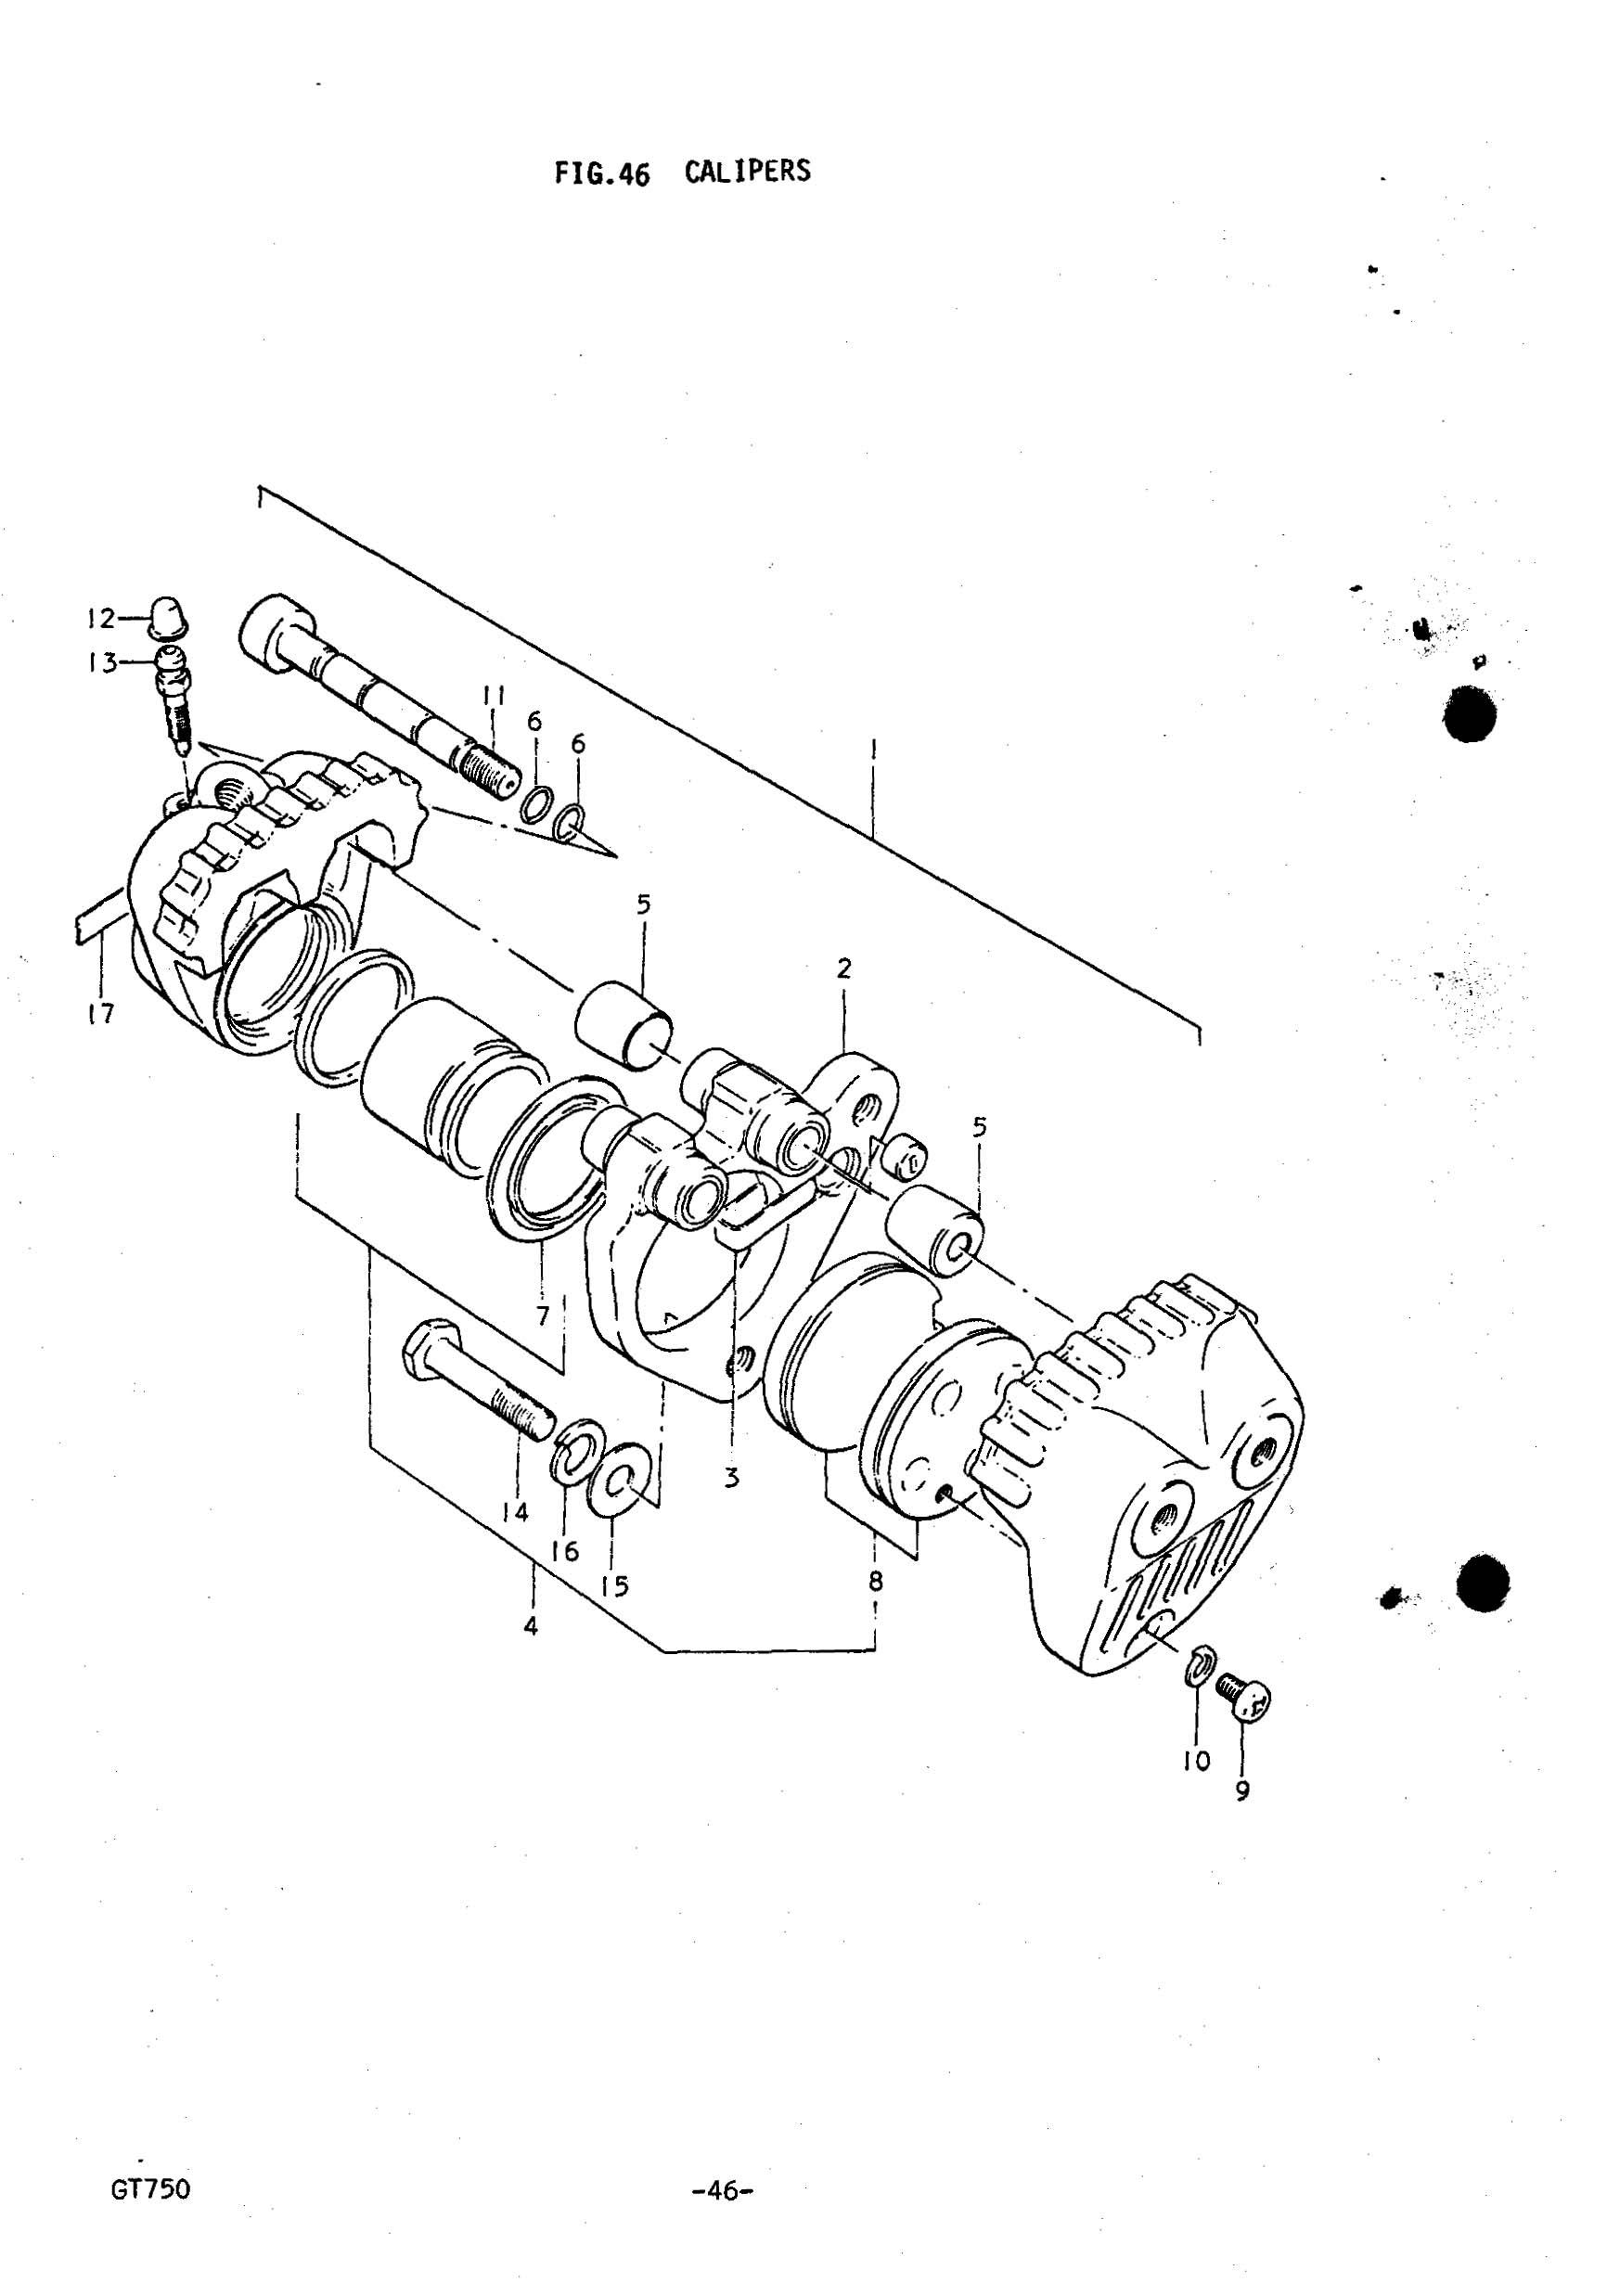 Genuine Suzuki Gt750 J M Caliper Piston Amp Seal